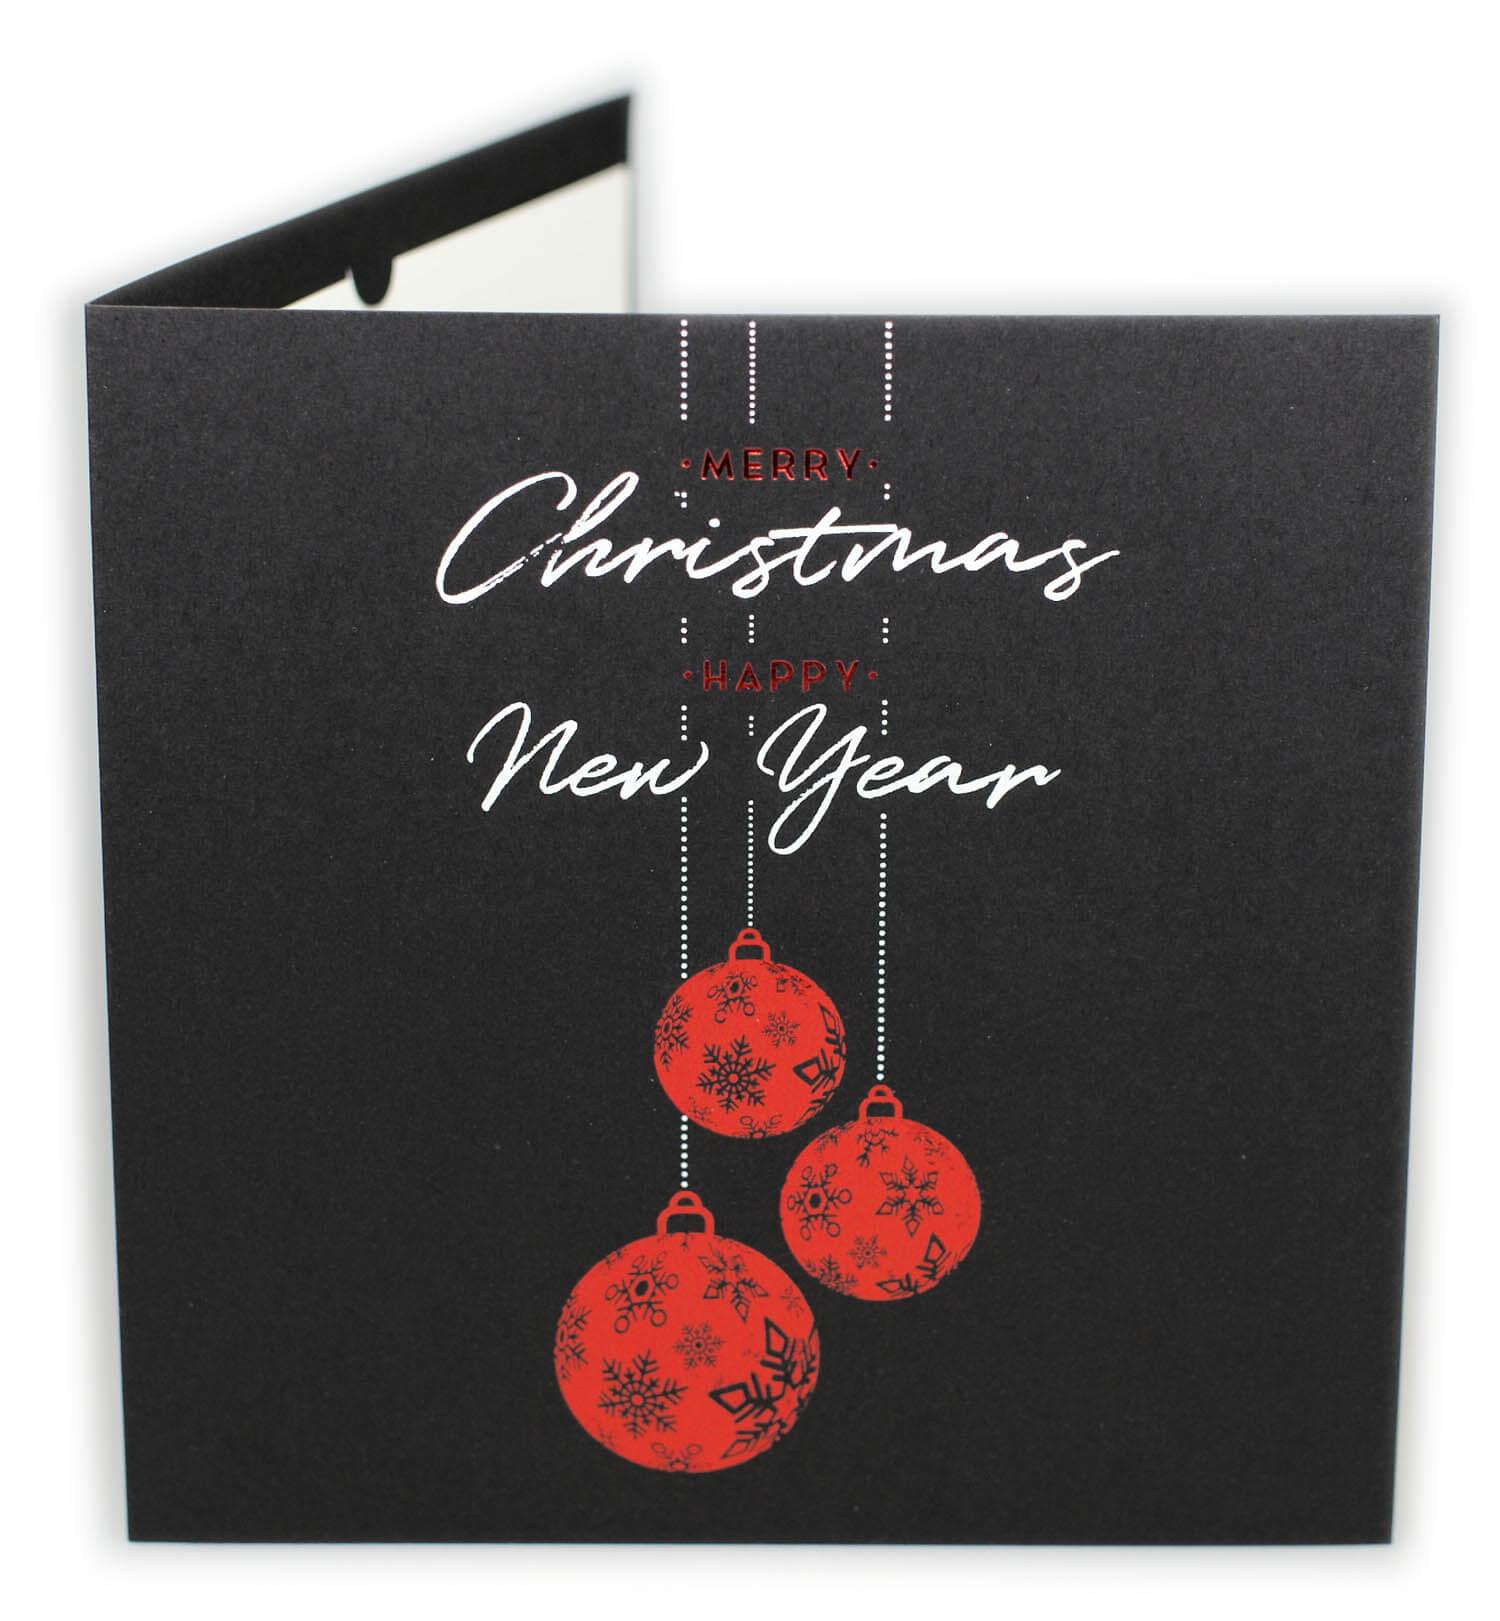 moderne weihnachtskarte in schwarz mit kugeln in rotem. Black Bedroom Furniture Sets. Home Design Ideas